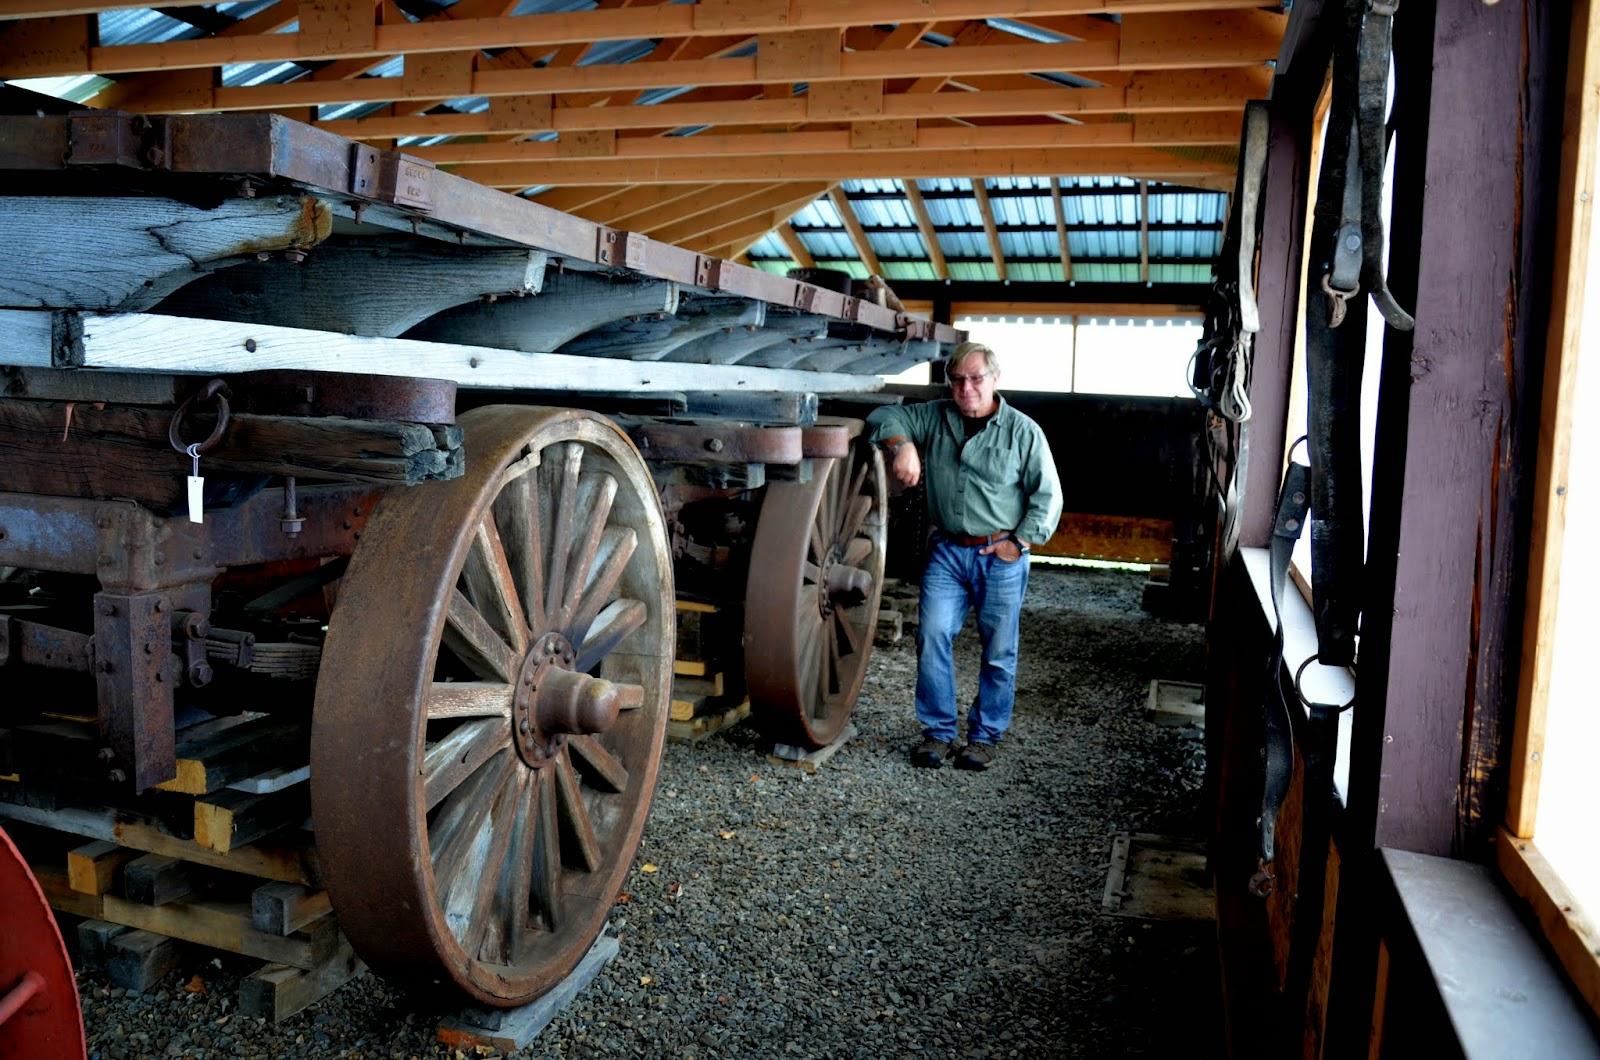 An old wagon